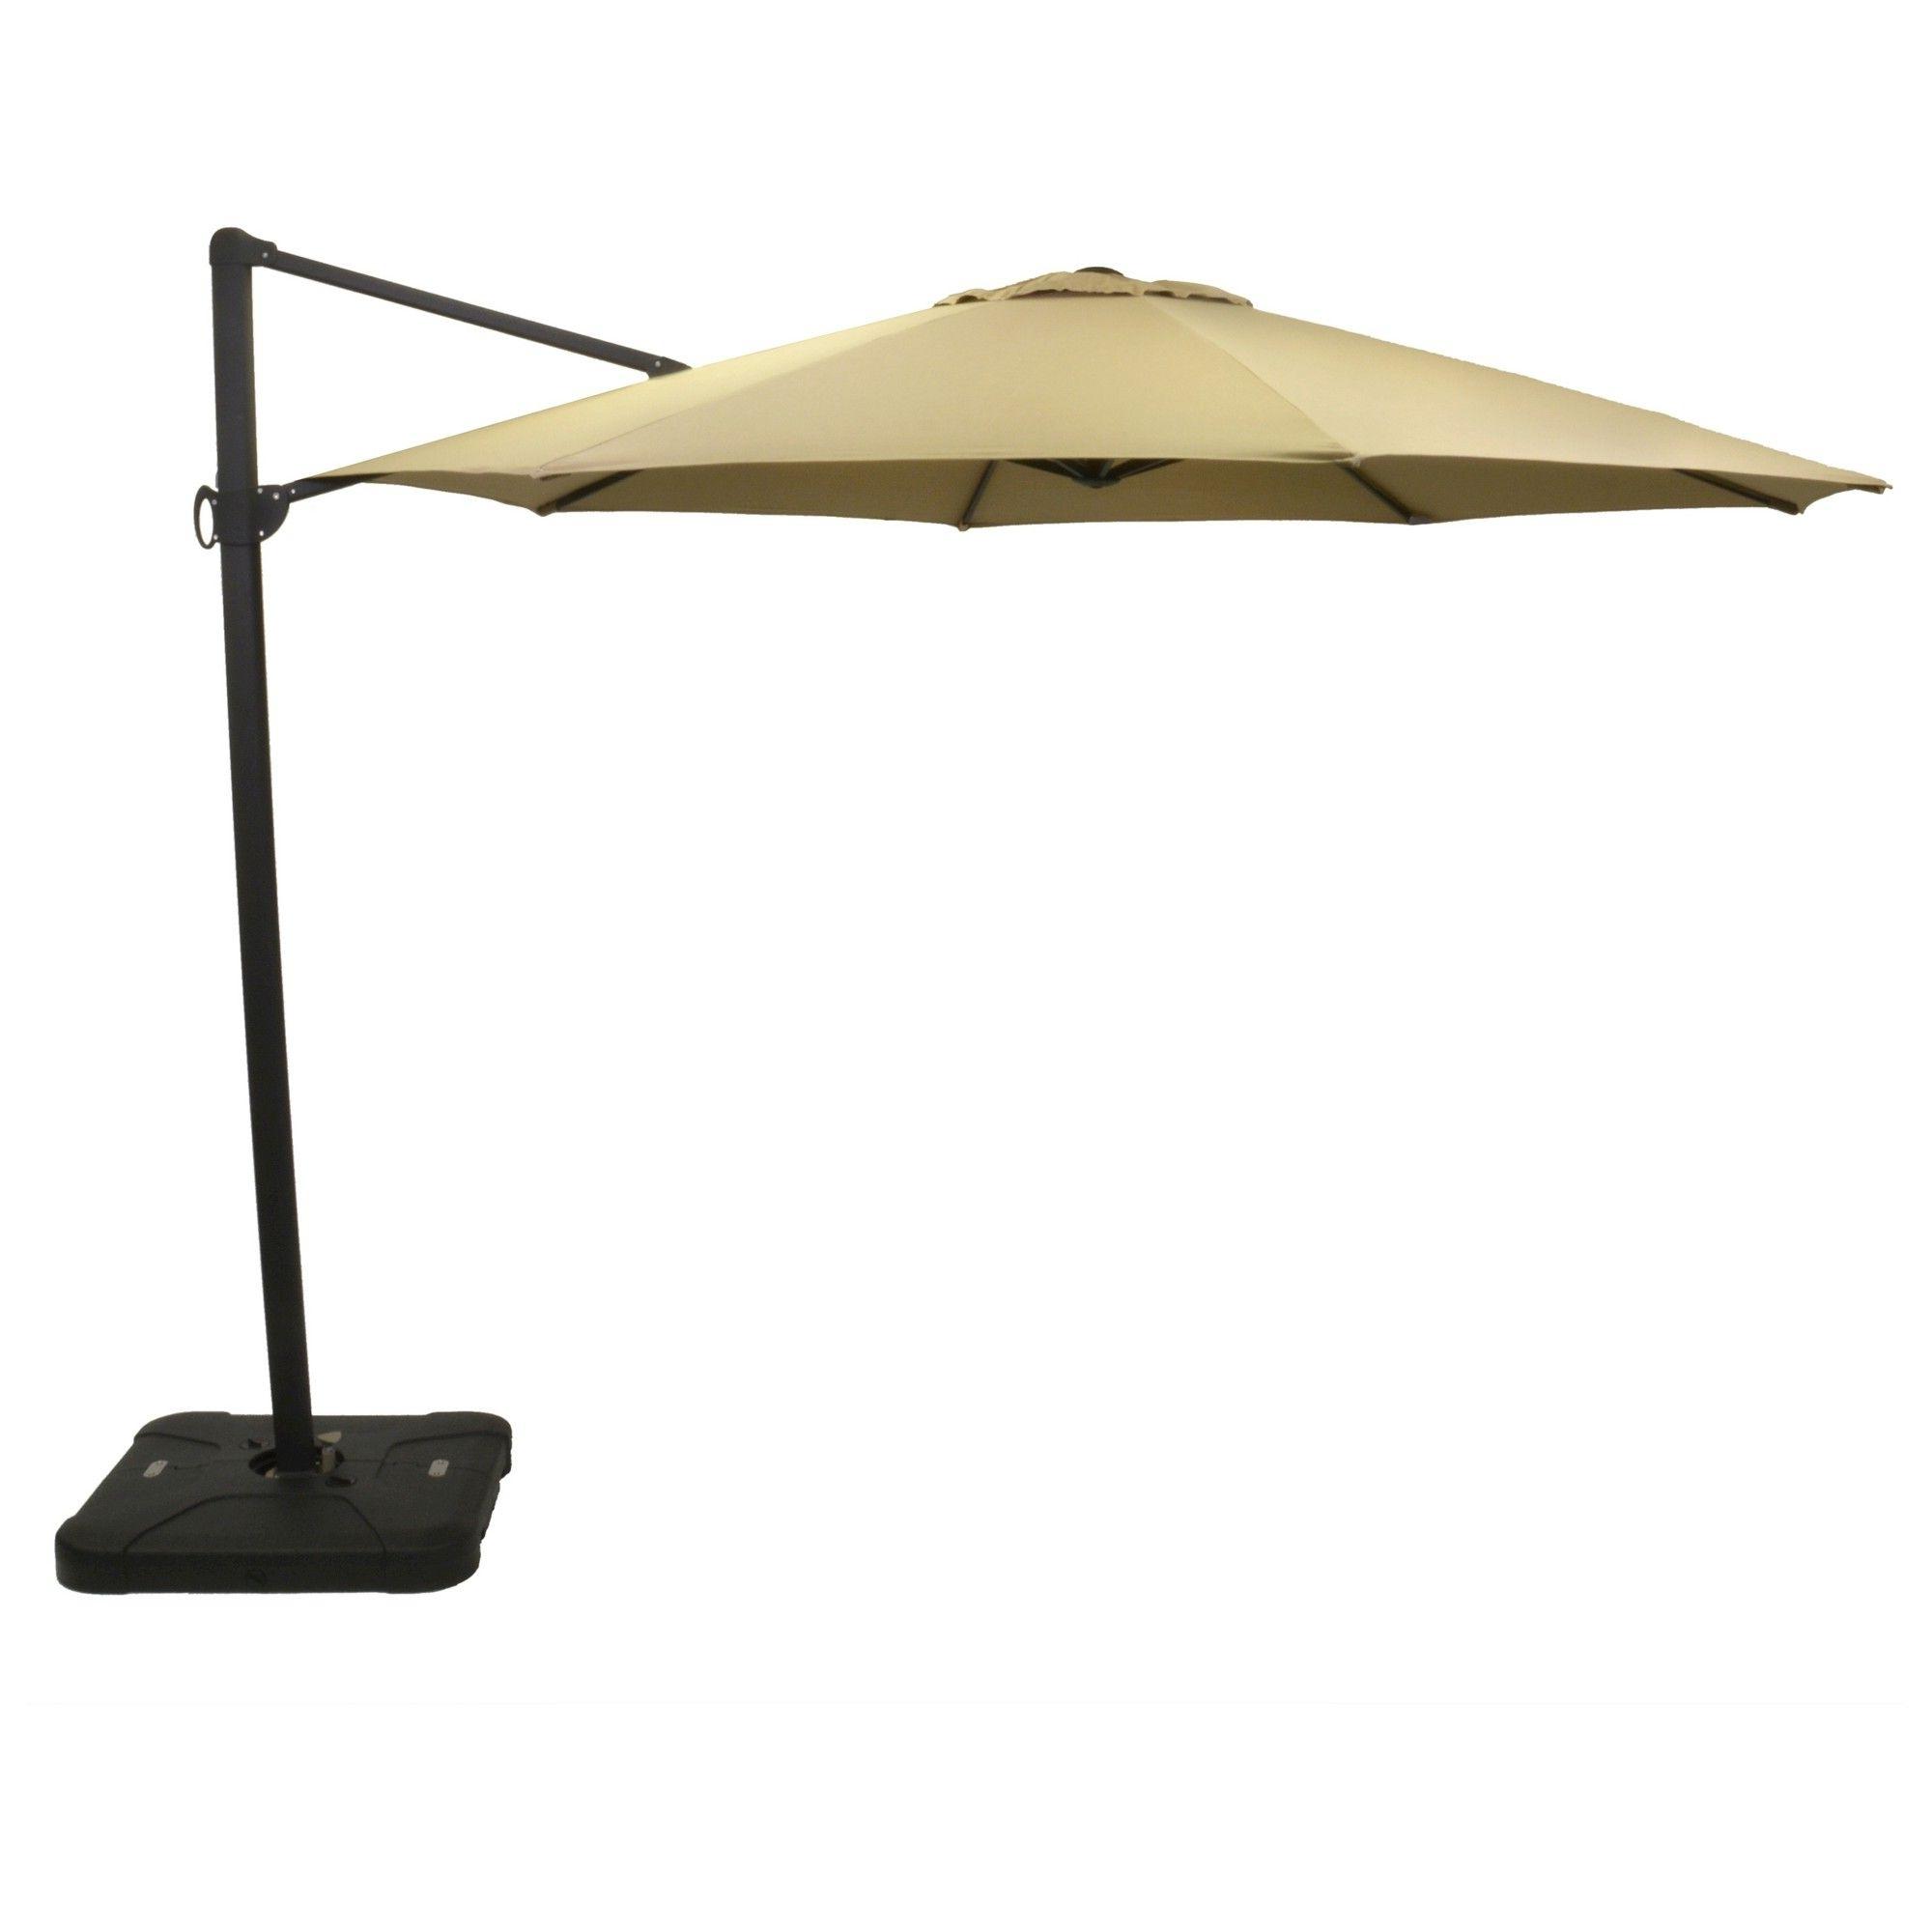 Sunbrella Patio Umbrella With Lights Regarding 2019 11' Offset Sunbrella Umbrella – Canvas Heather Beige – Black Pole (View 16 of 20)